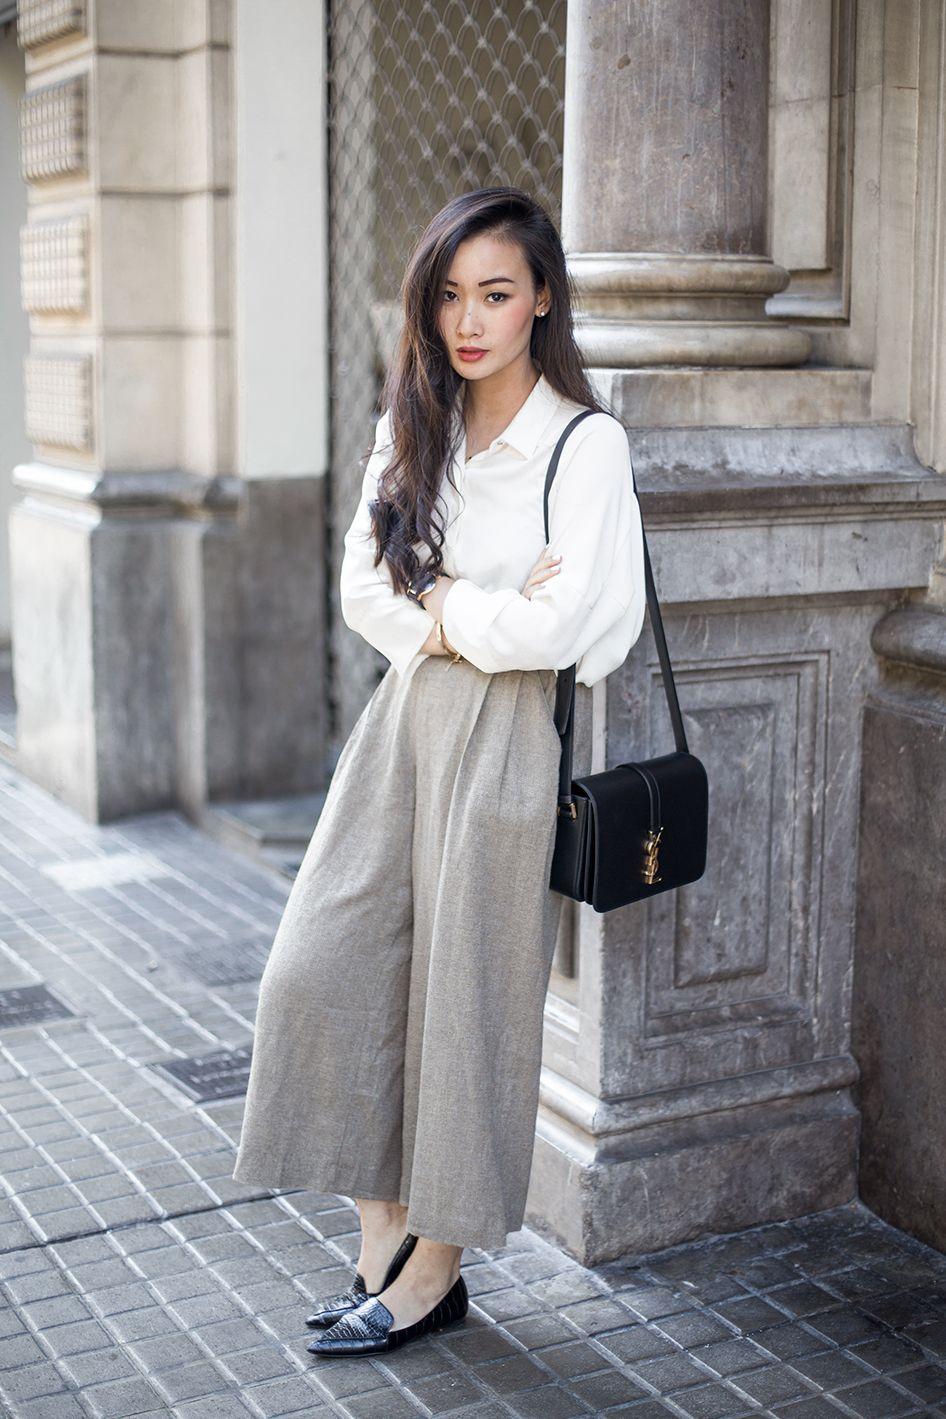 culottes  white blouse  pointed flats  gaya berpakaian